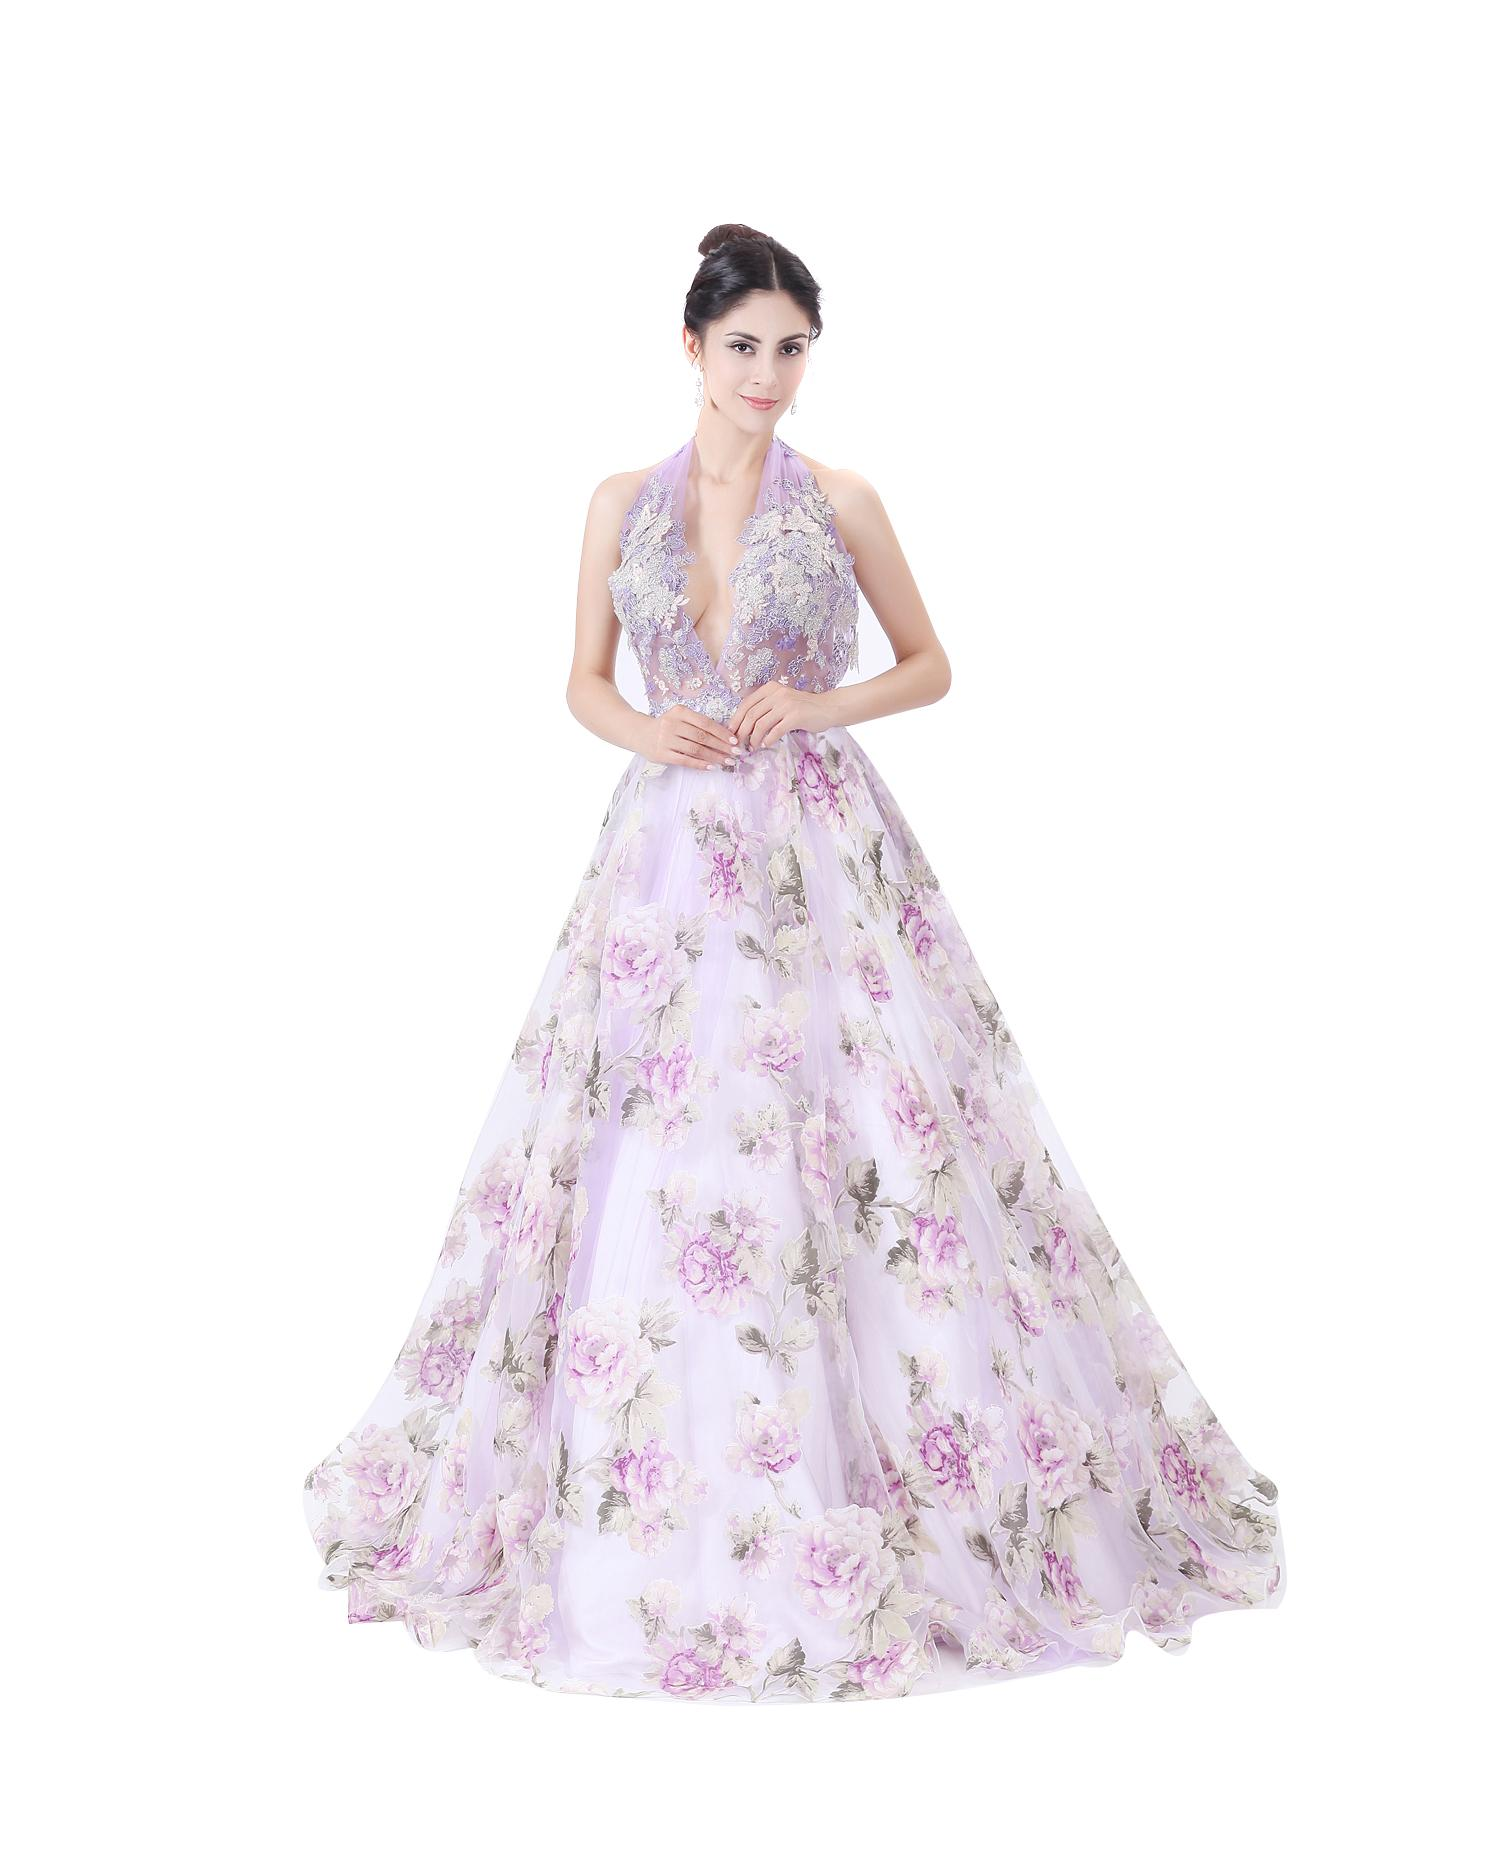 https://www.dhresource.com/0x0s/f2-albu-g4-M01-BA-C3-rBVaEVnLV9WAHLV1AAzGv6BhtYM782.jpg/modabelle-women-039-s-organza-print-wedding.jpg